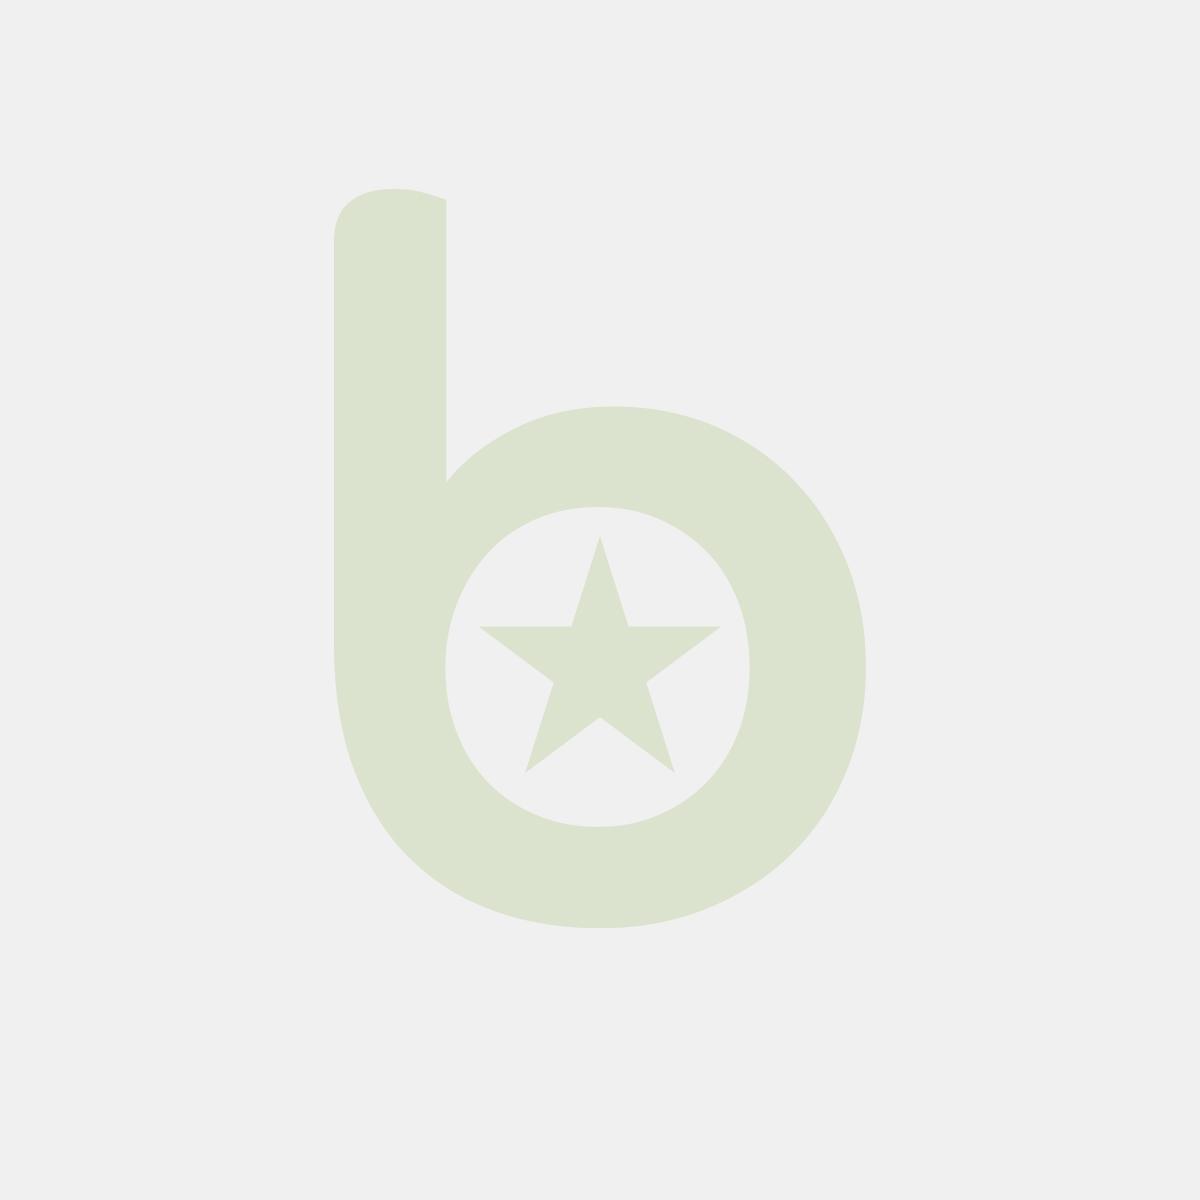 FINGERFOOD - pucharek 95ml PS czarny 5,7x5,8x5,7 op. 25 sztuk